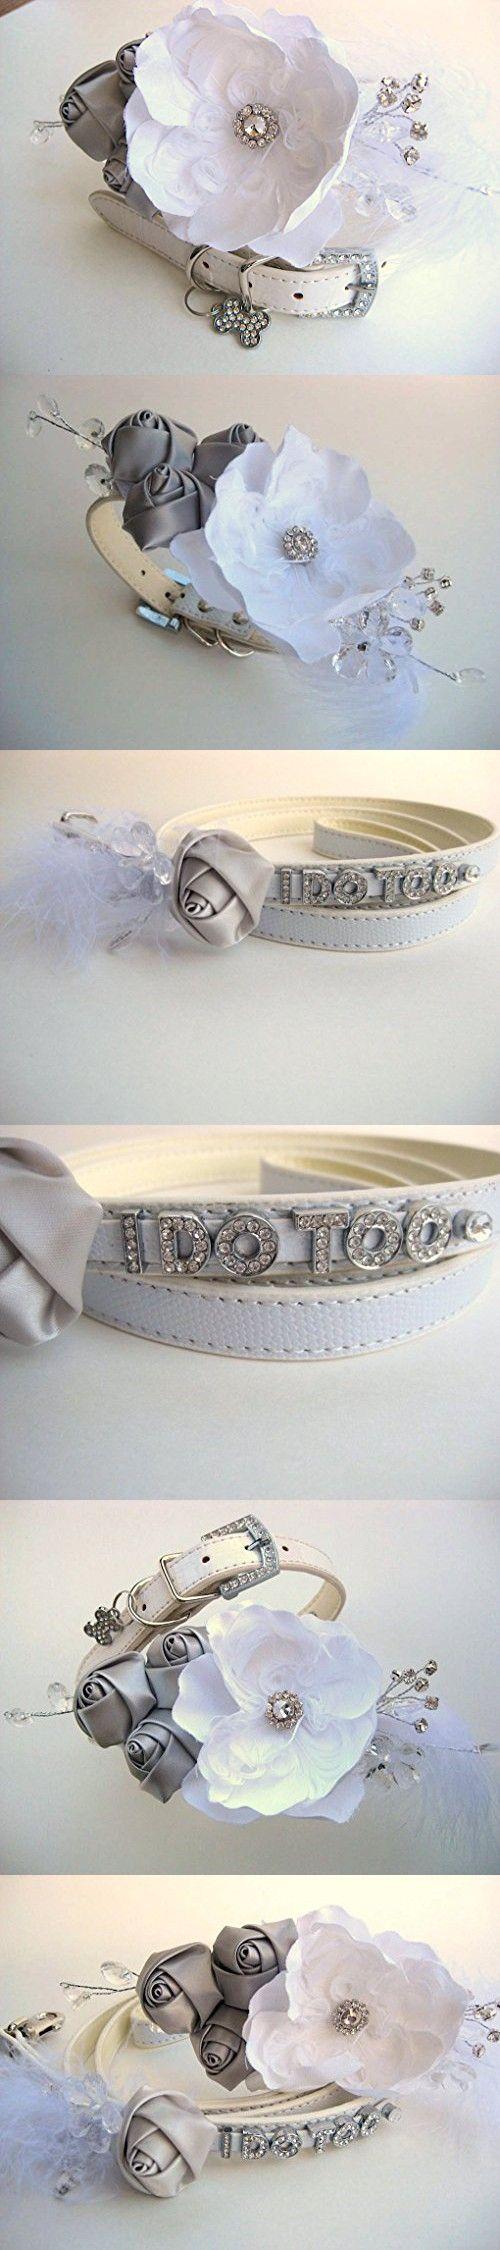 "Wedding Flower Dog Collar | Large Dog Collar and Matching Leash | Flower Dog Collar | White and Silver | Wedding Dog Collar | 15.5""-20"" neck"